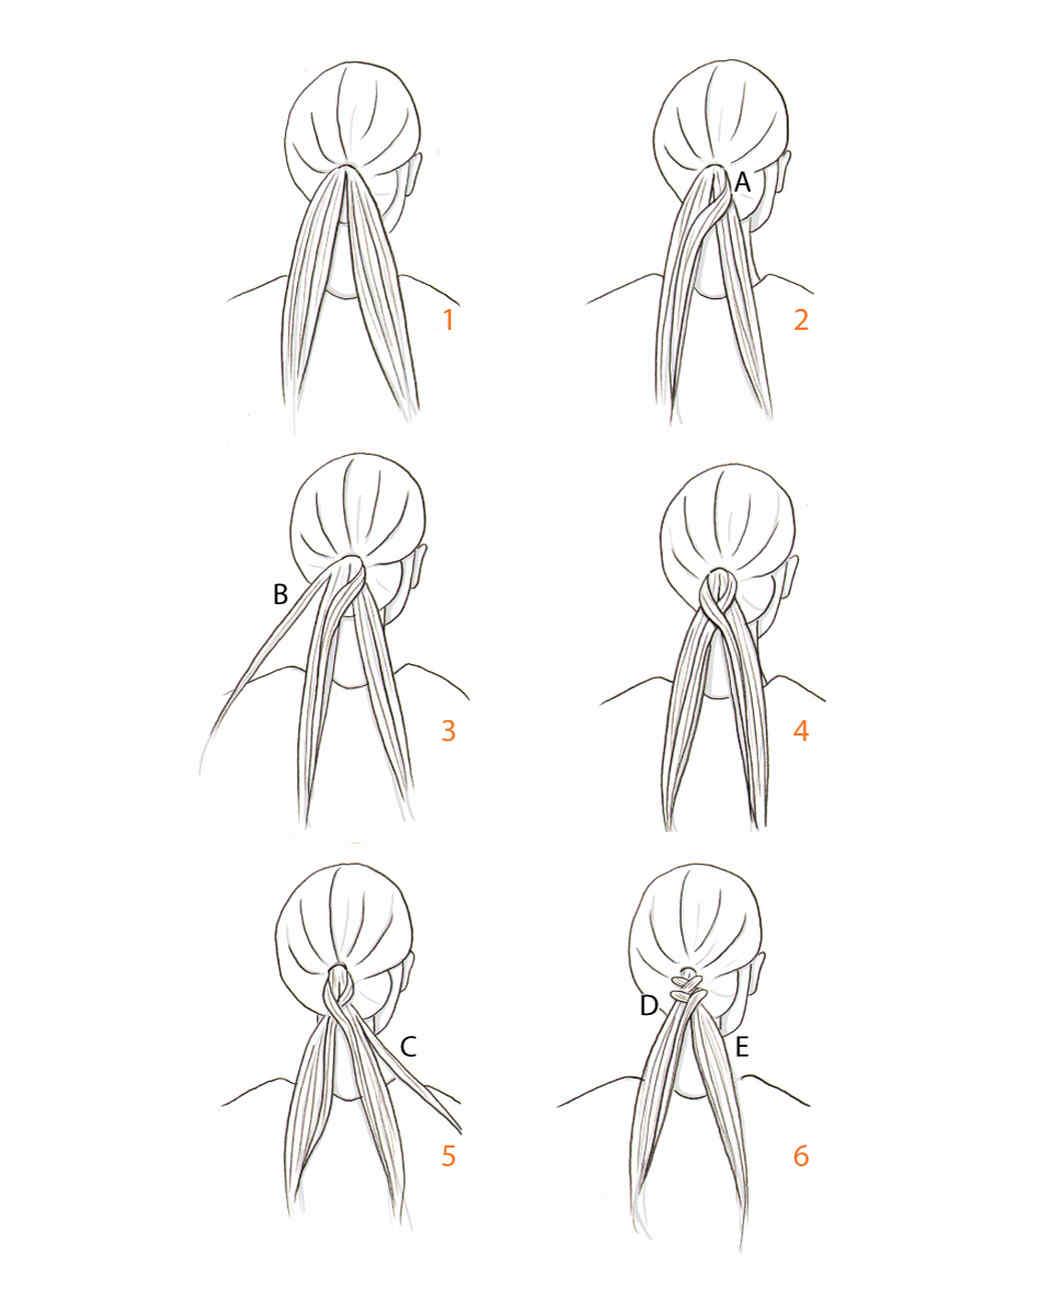 braids-fishtail-illustration-mi108987.jpg